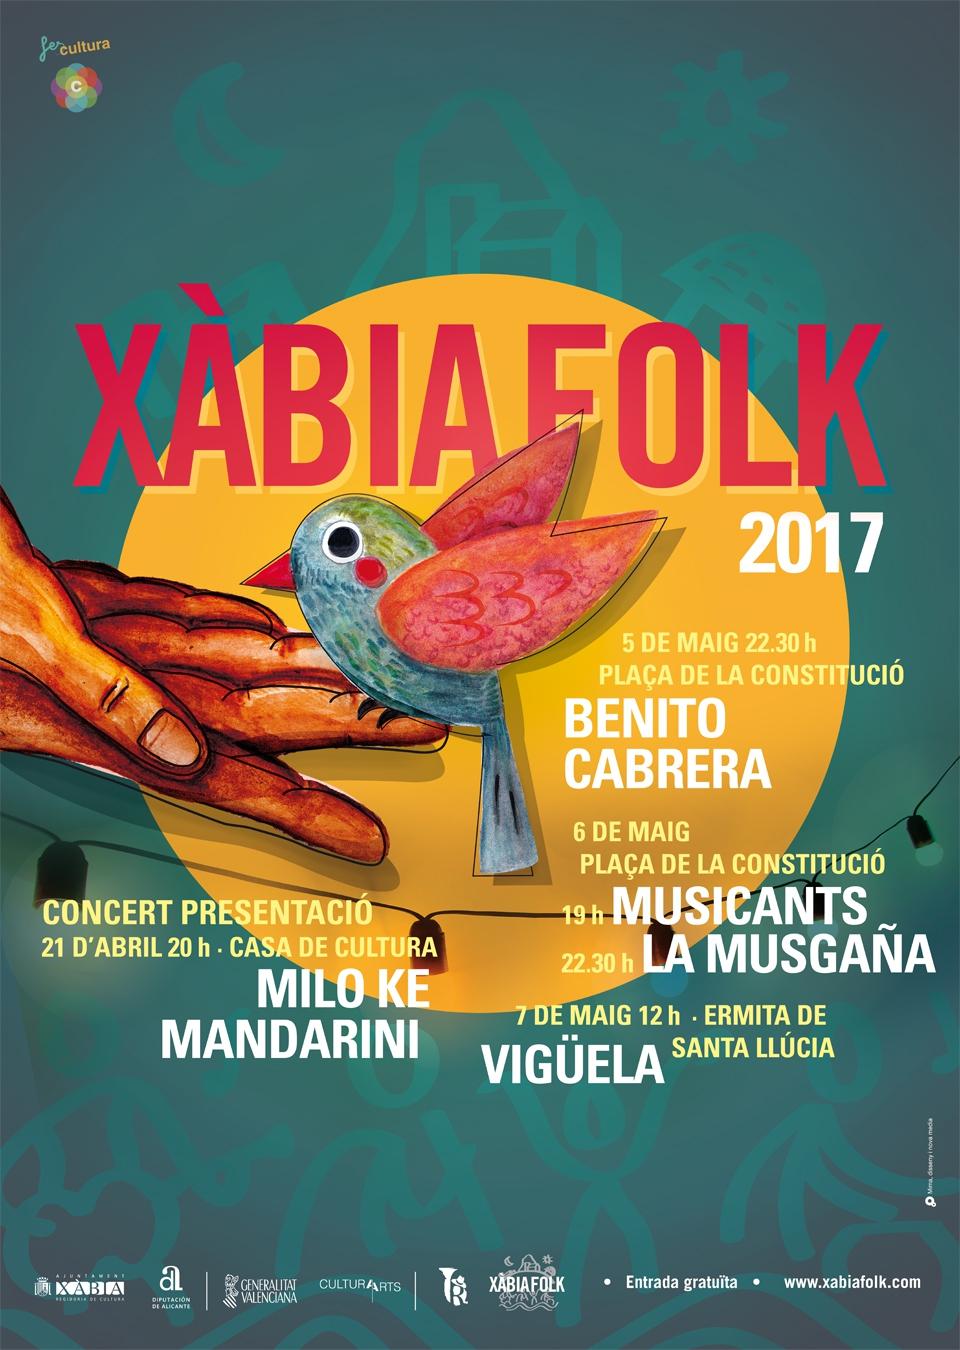 Xabia Folk 2017